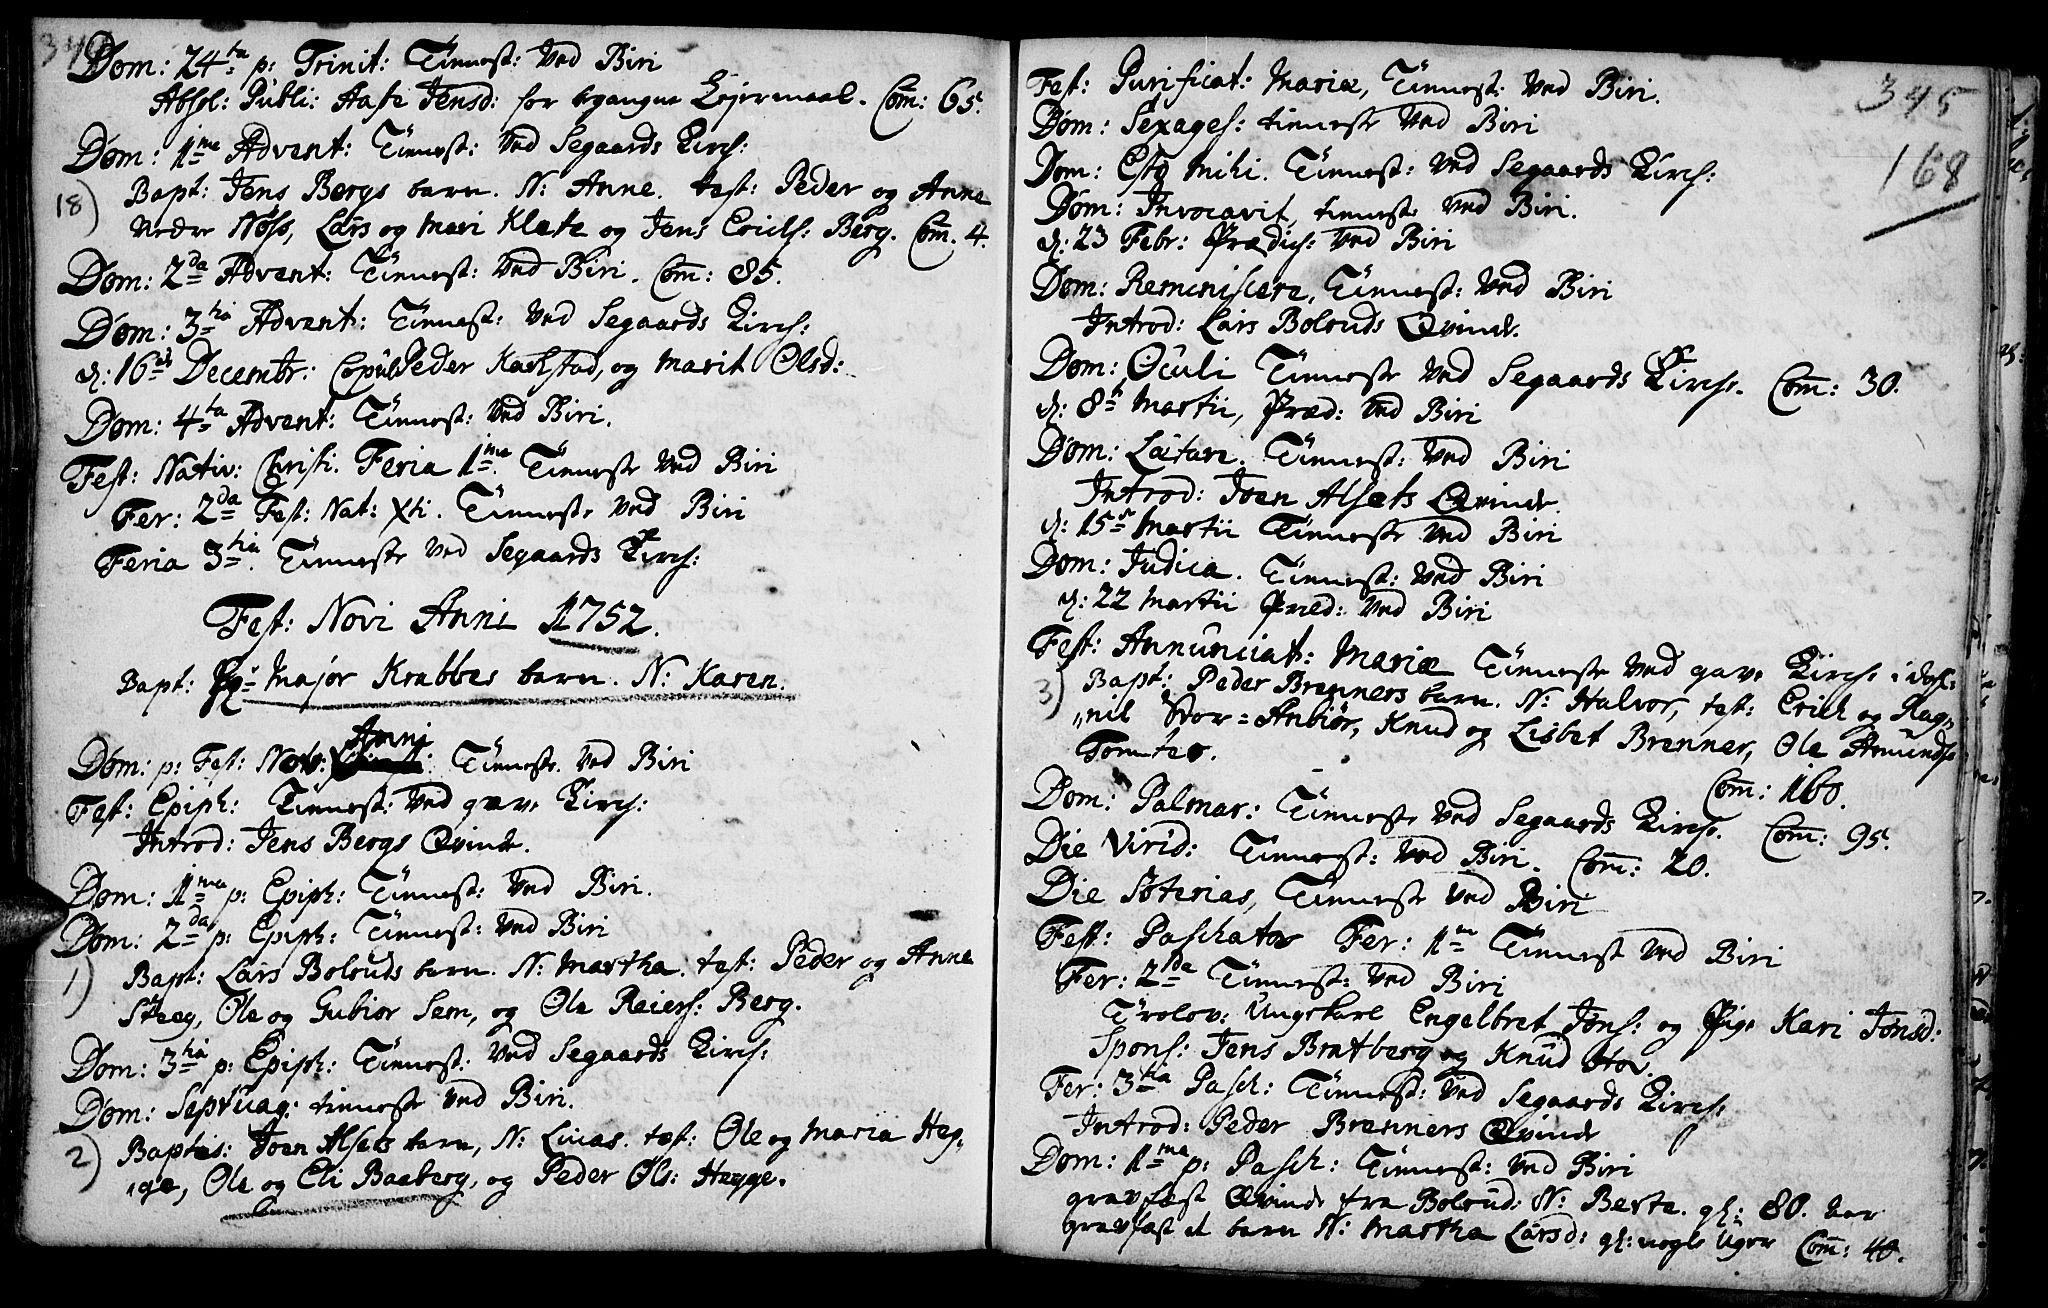 SAH, Biri prestekontor, Parish register (official) no. 1, 1730-1754, p. 168